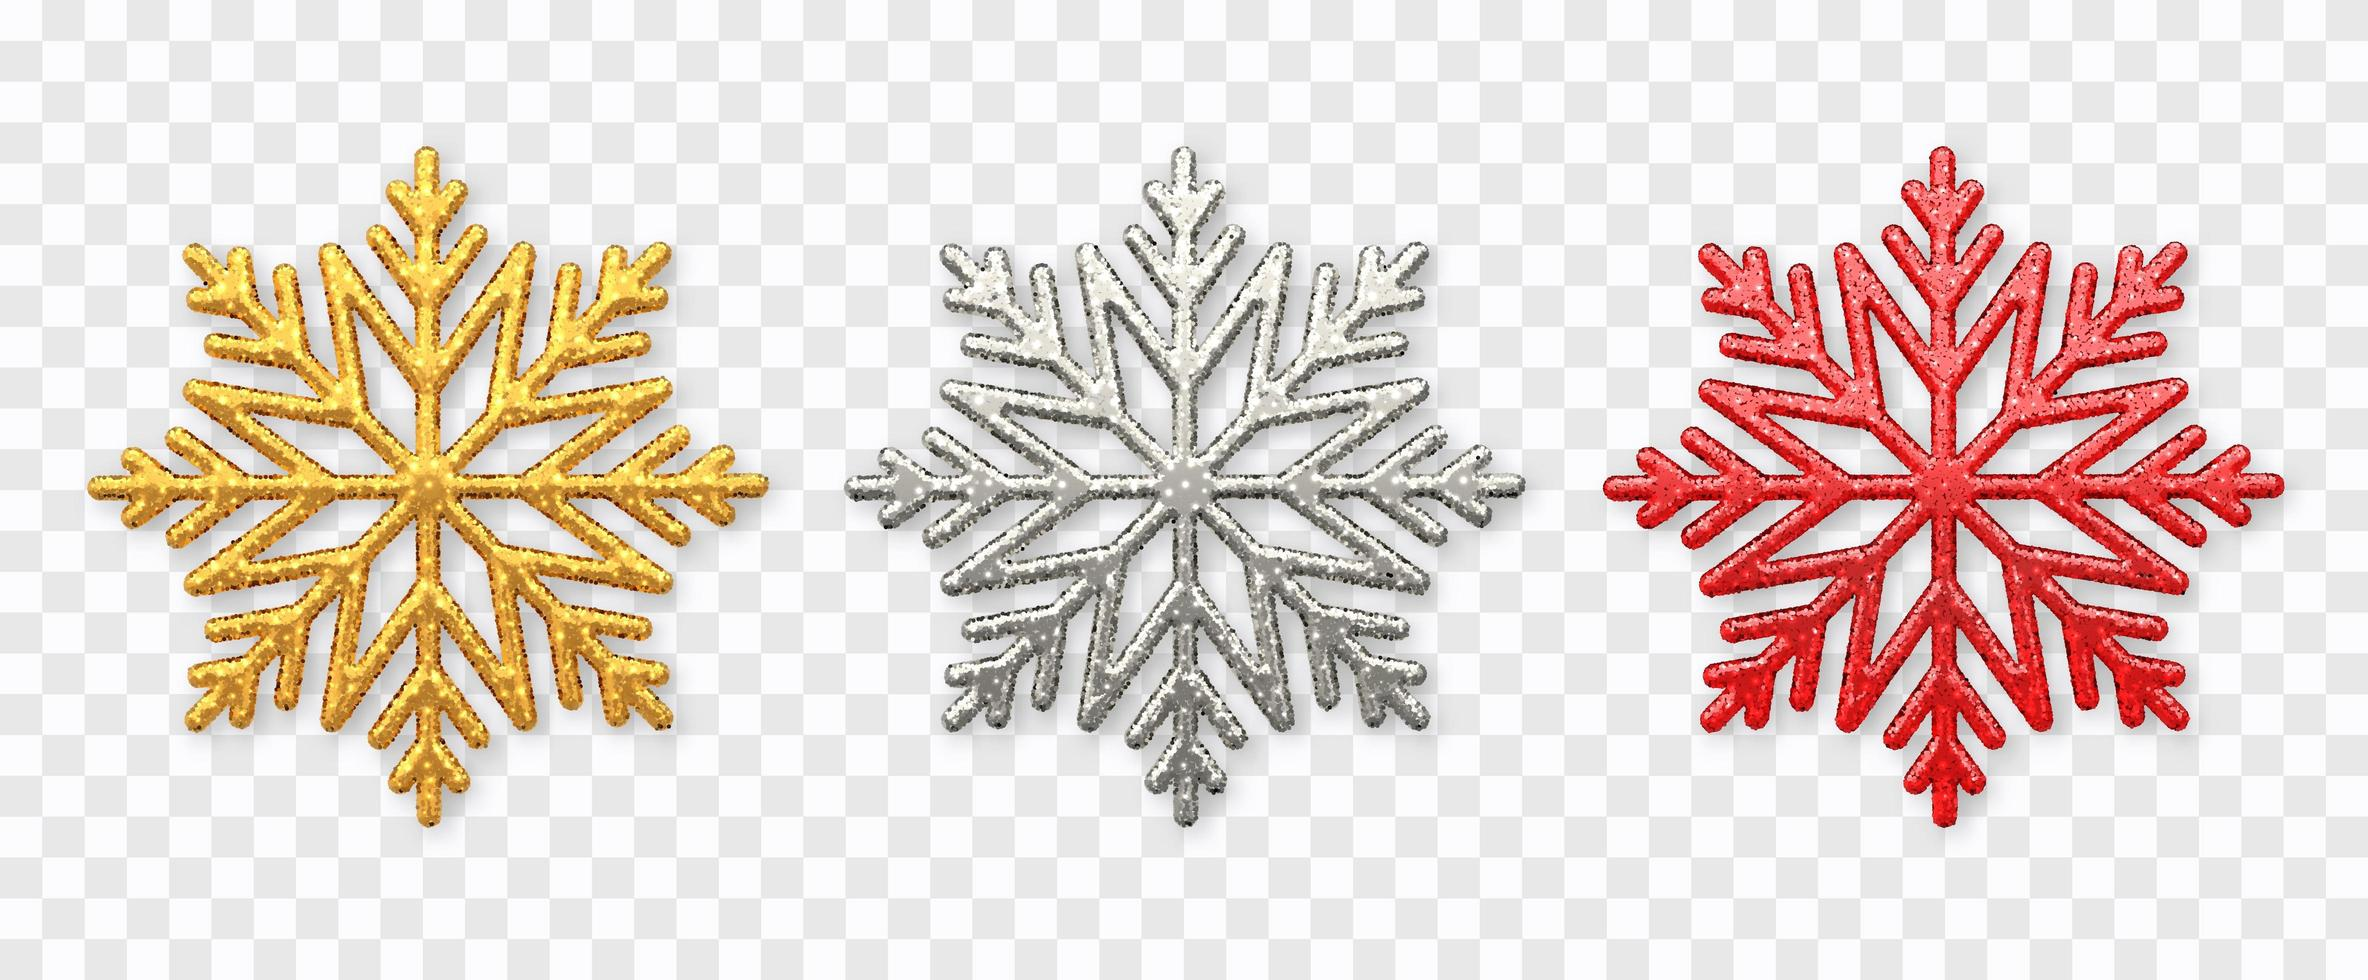 mousserande gyllene, silver och röda snöflingor vektor